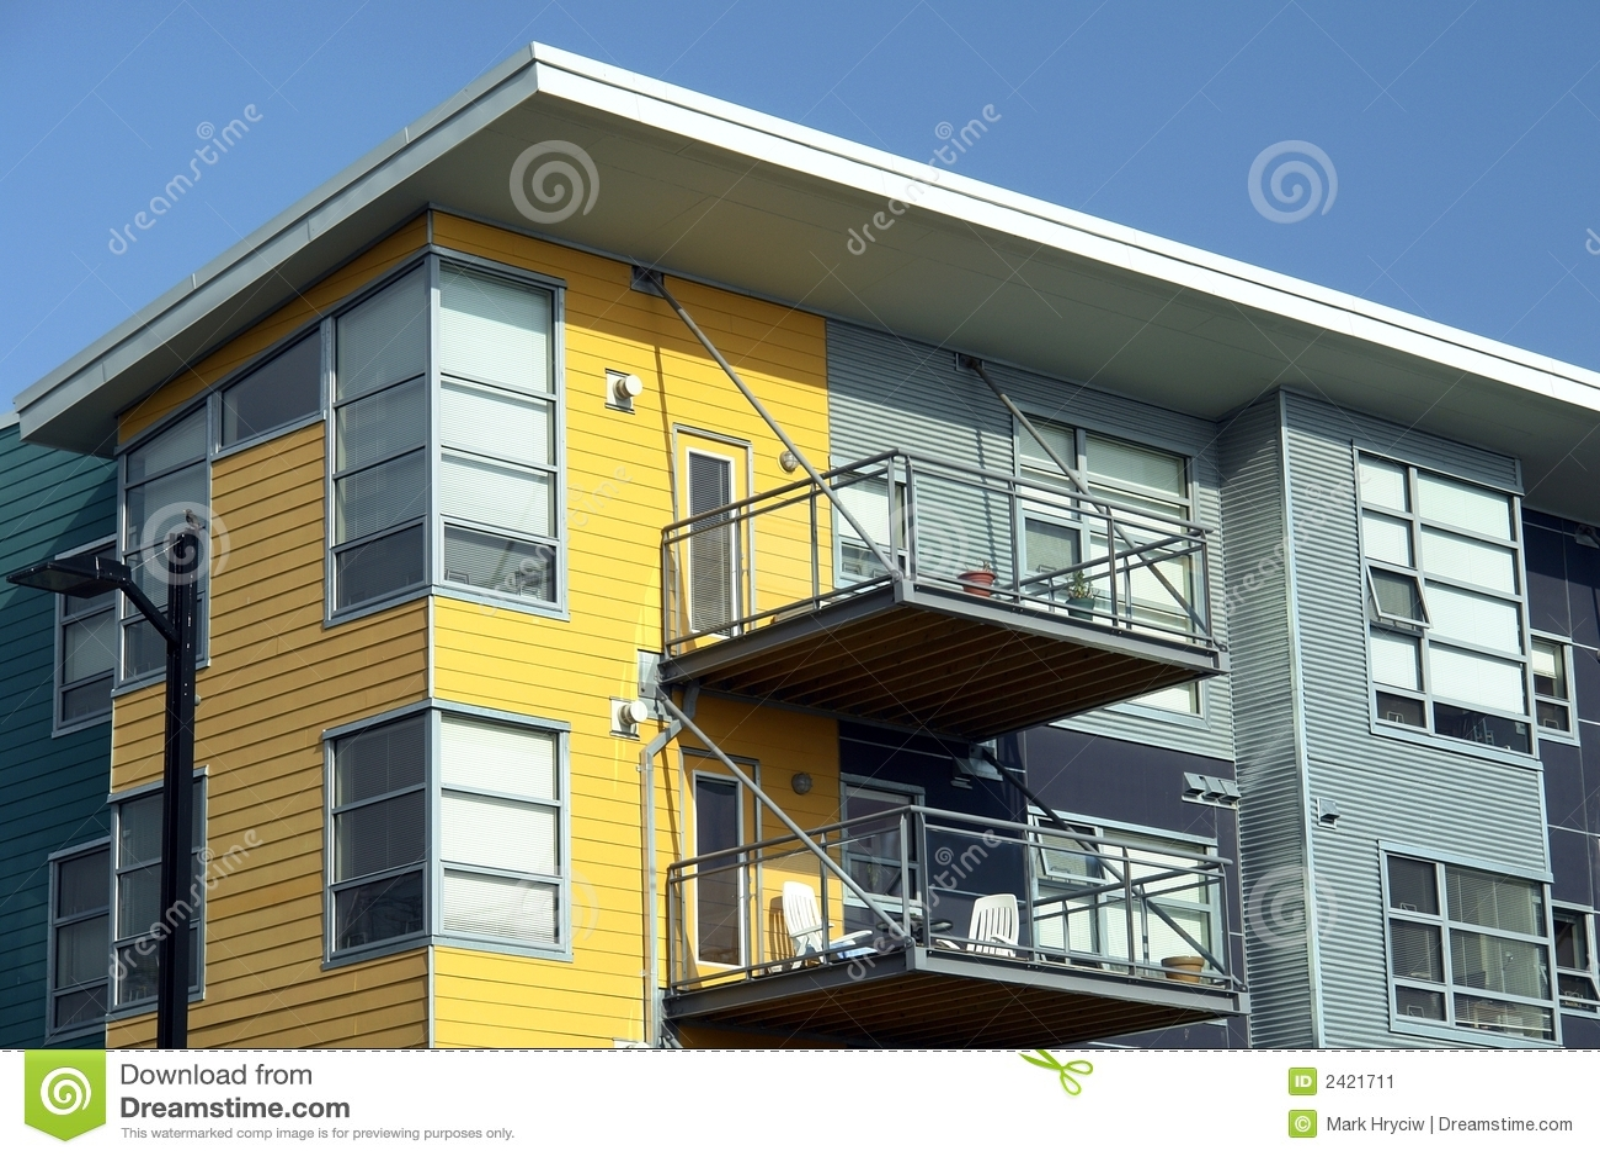 Modern Apartments modern apartments royalty free stock photo - image: 7726285